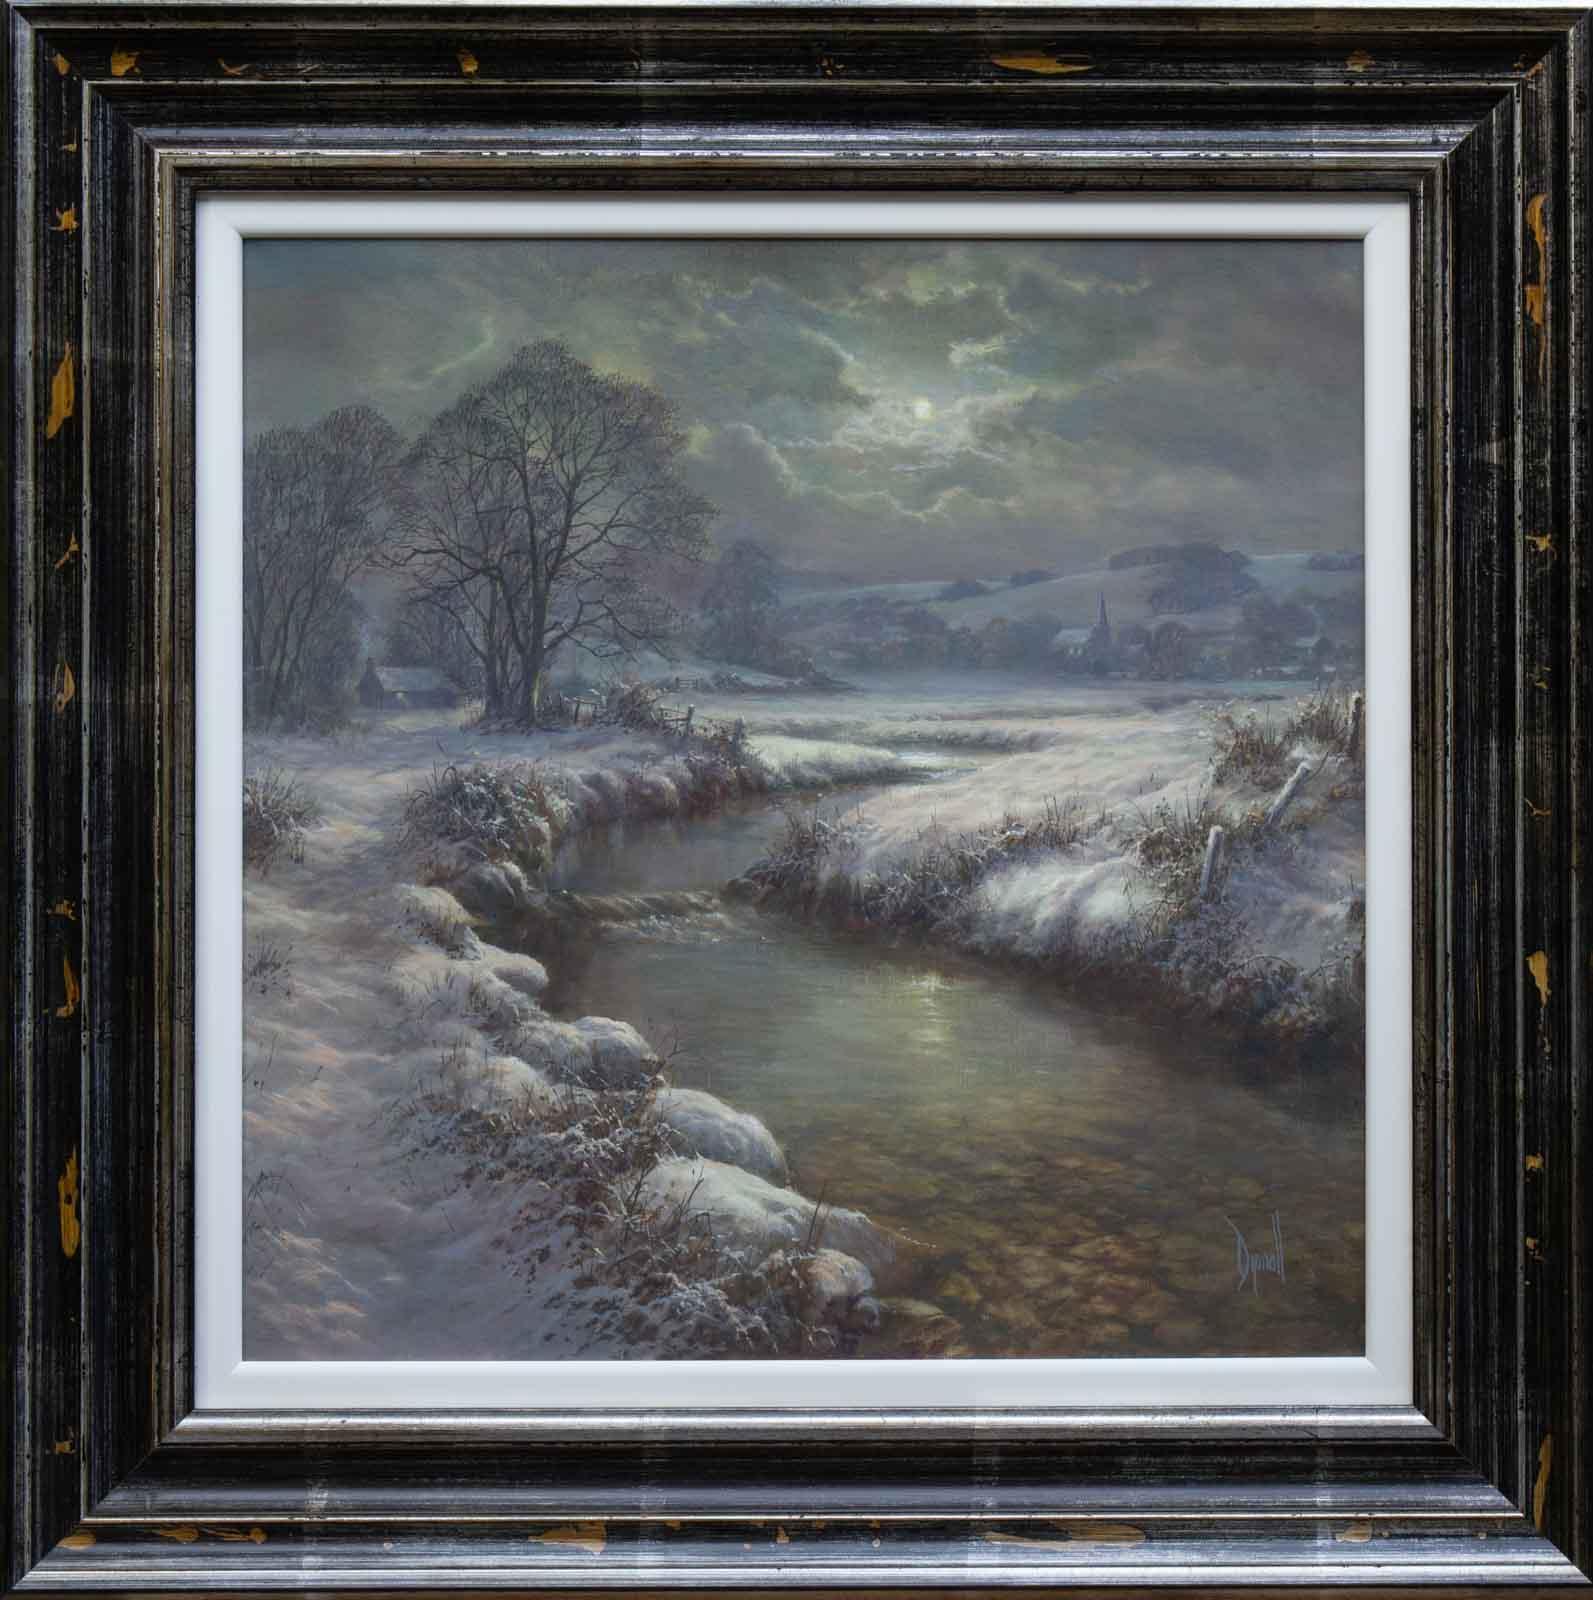 White Christmas, David Dipnall